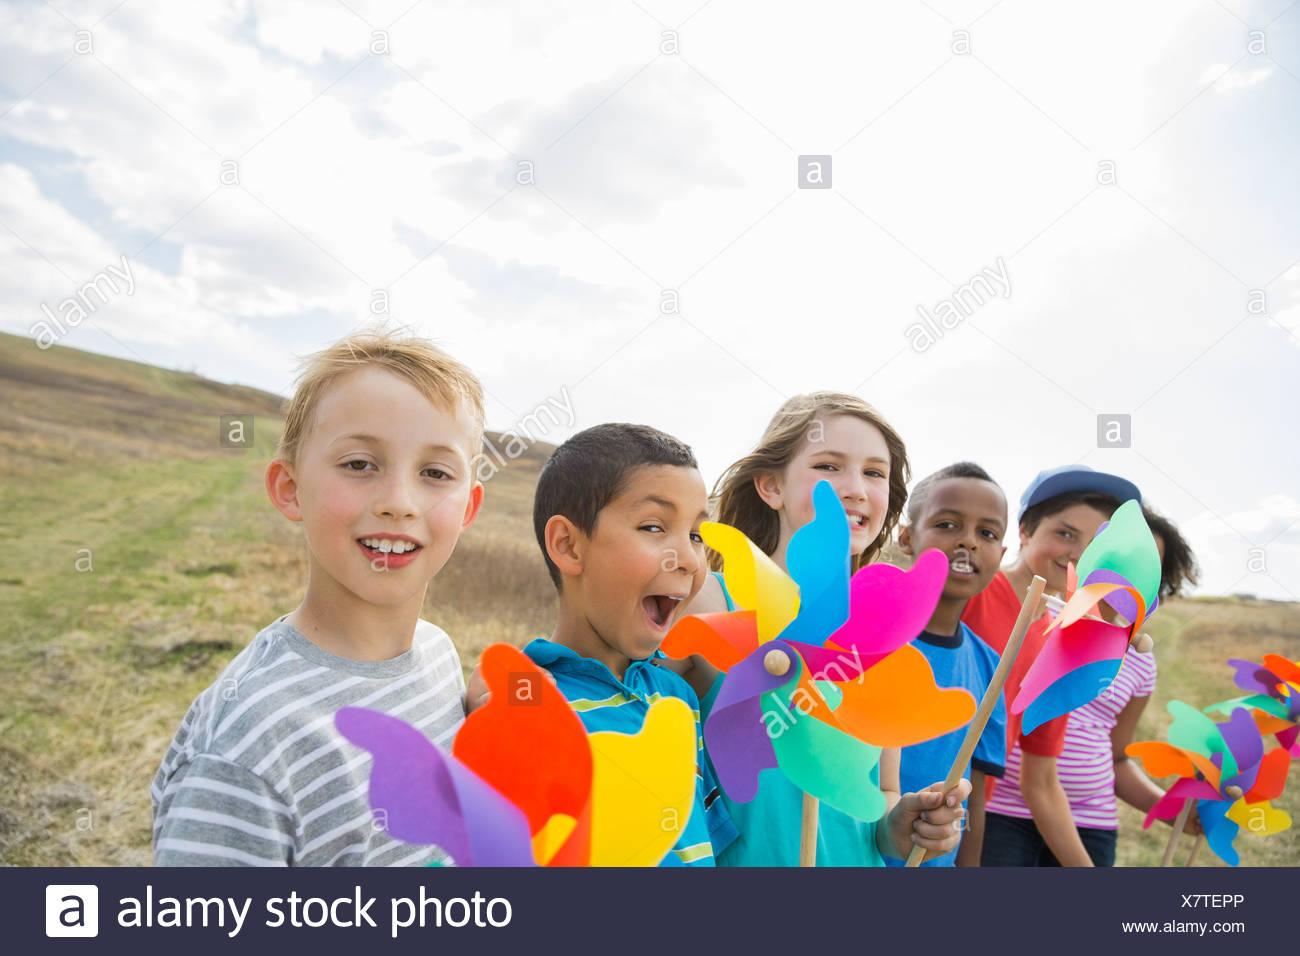 Portrait of schoolchildren holding pinwheels outdoors - Stock Image